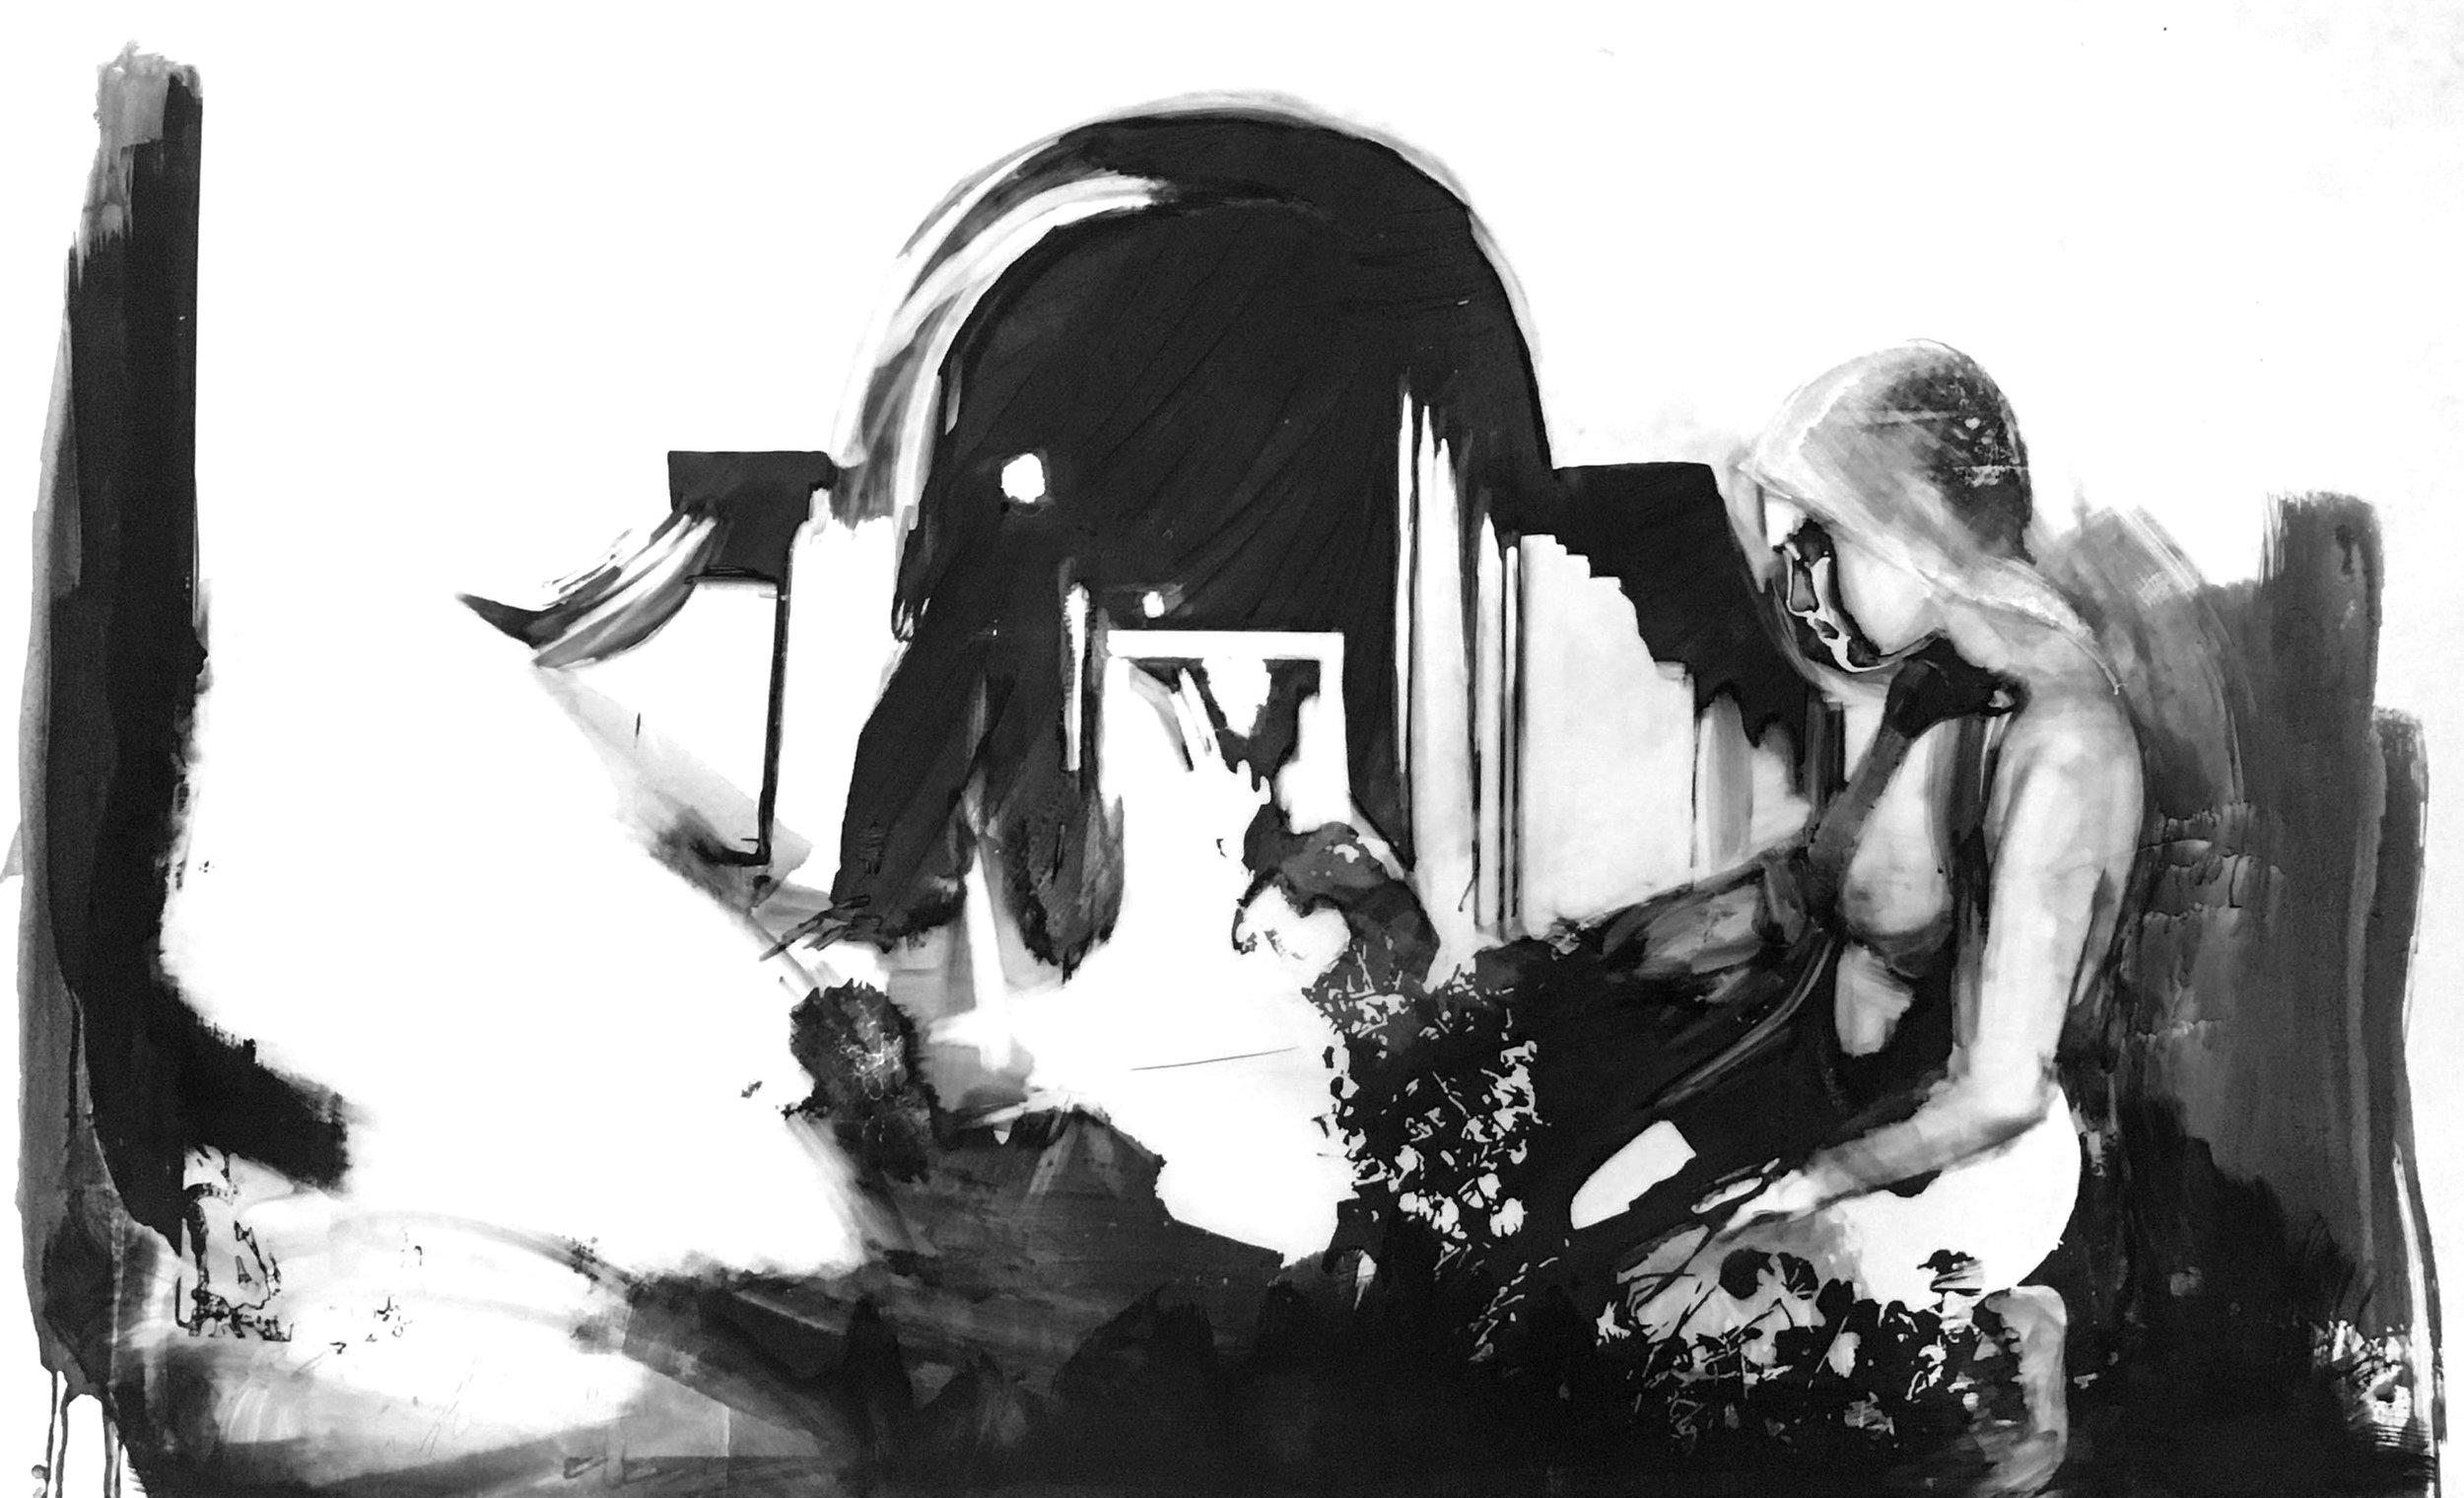 darkroom composition 1